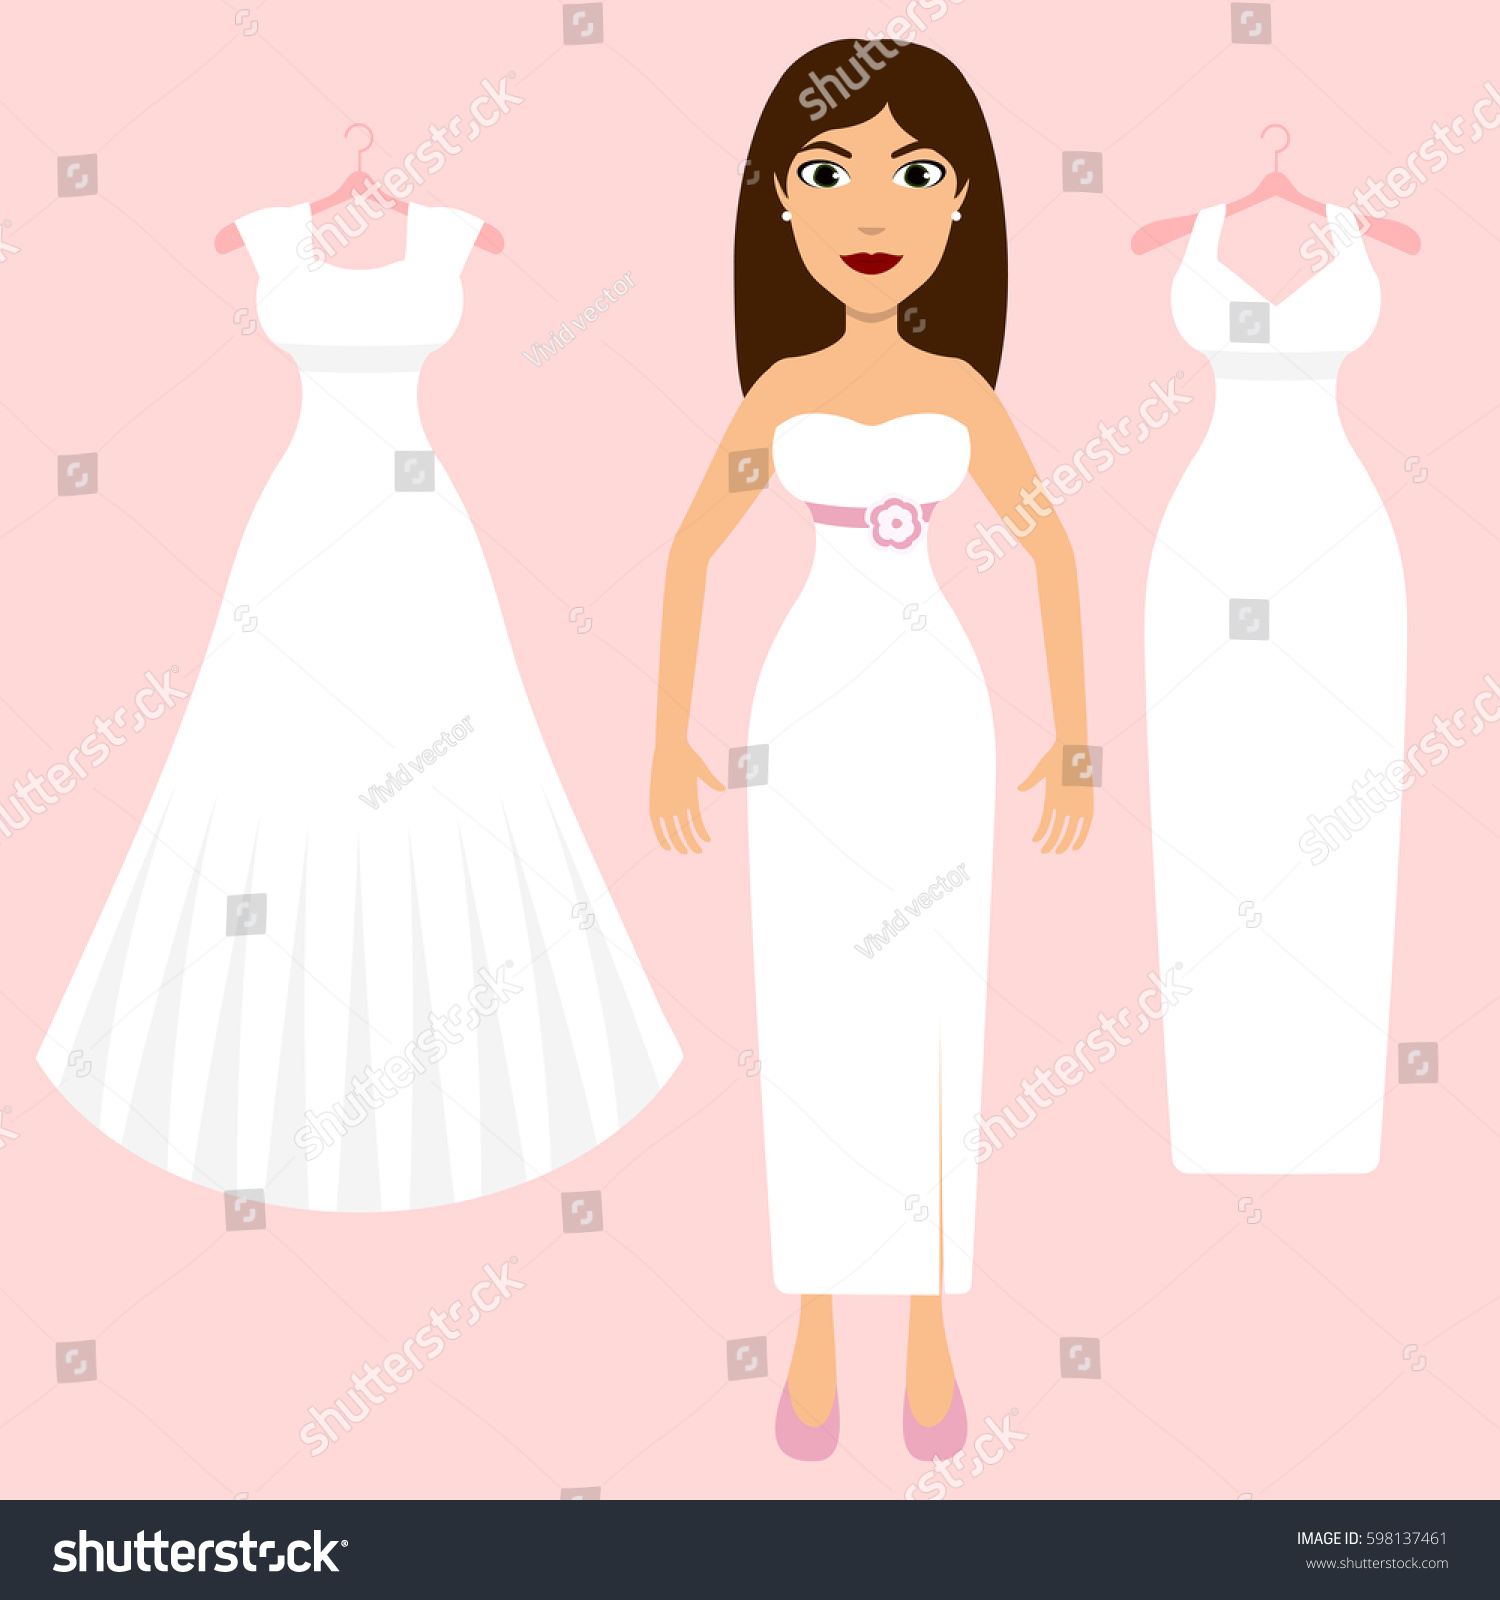 Wedding Dress Fitting Bride Different Wedding Stock Vector (Royalty ...